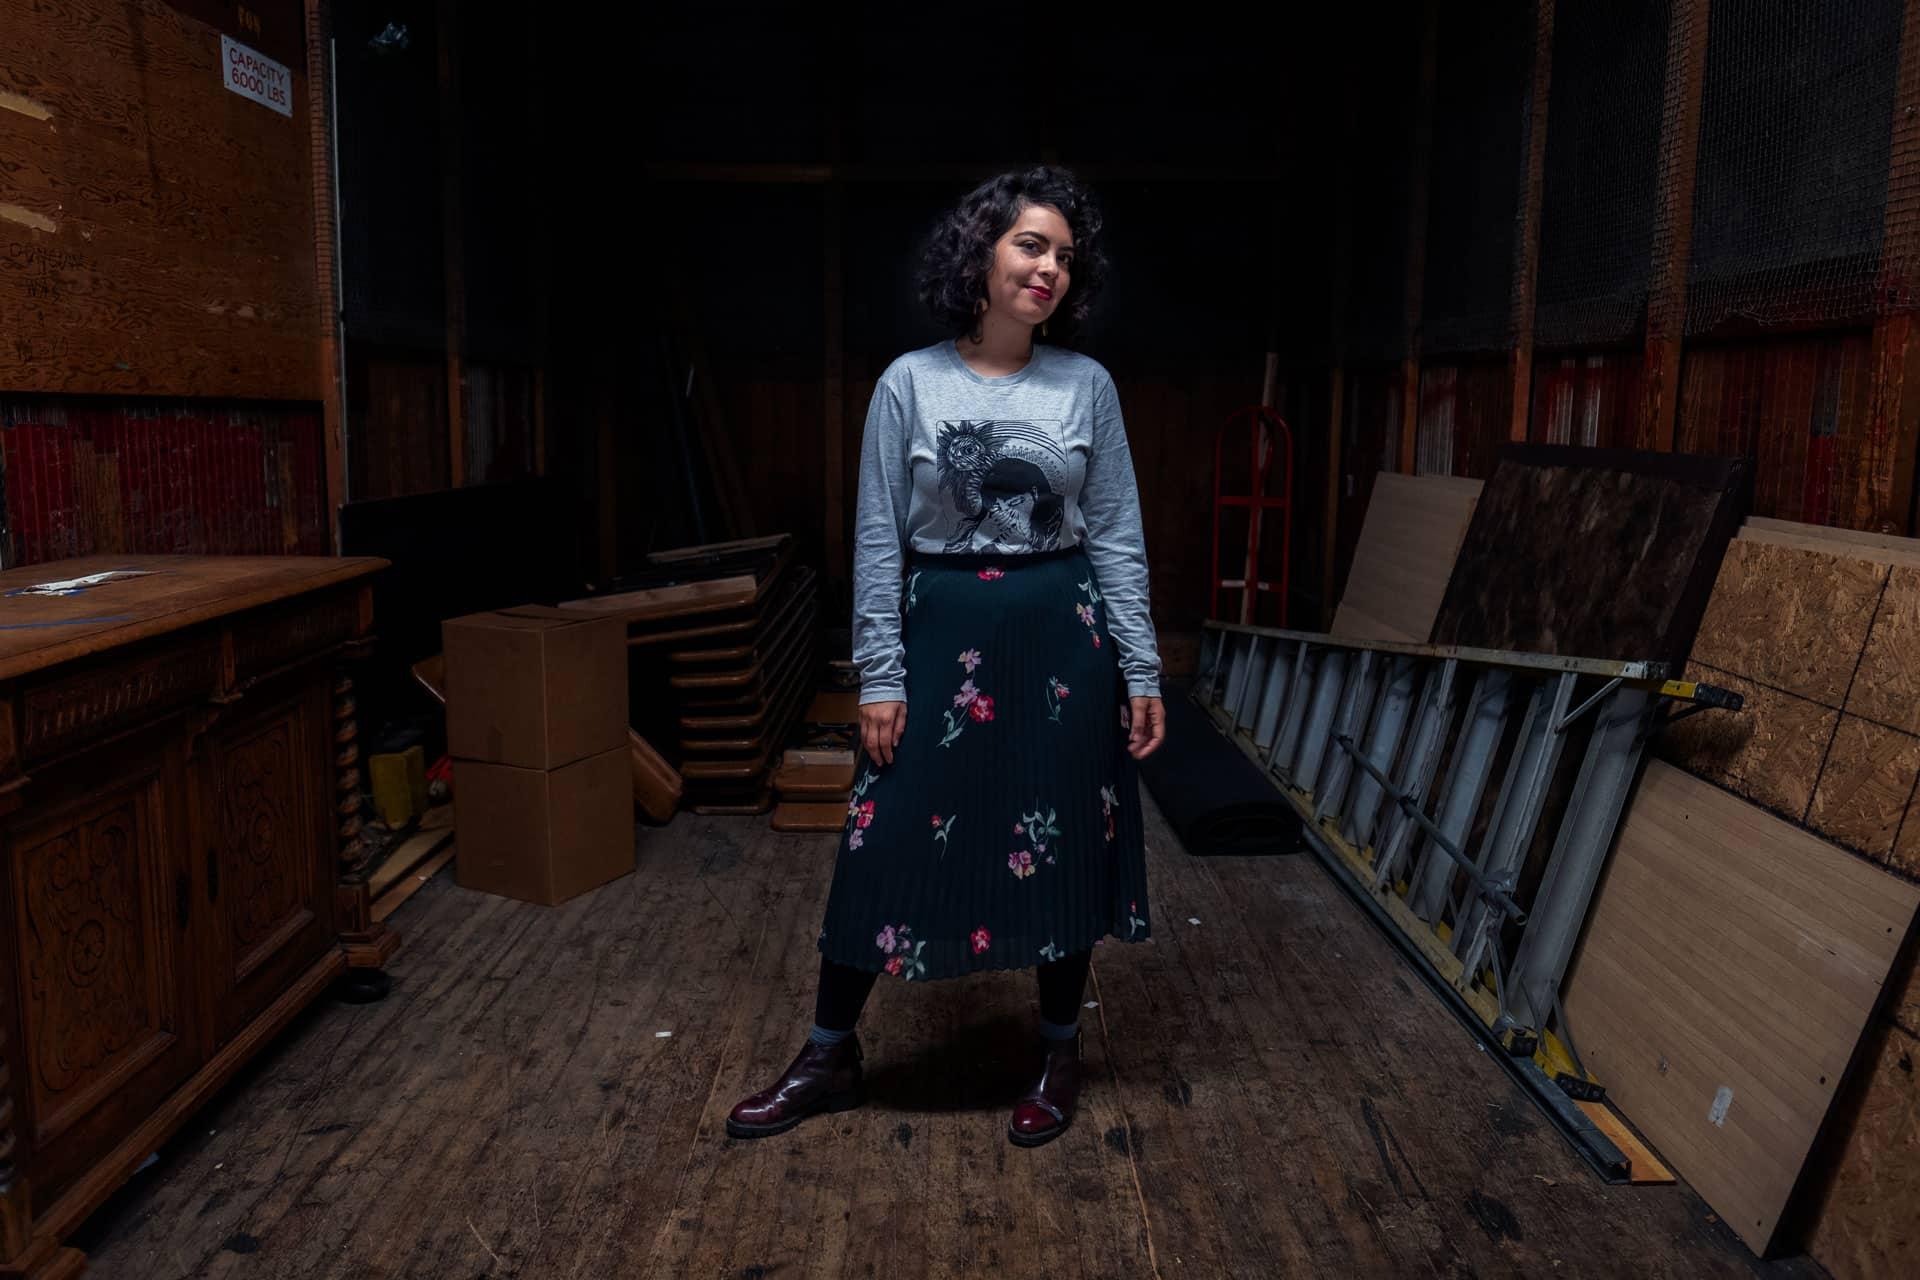 Elevating Stories—Malaka Gharib